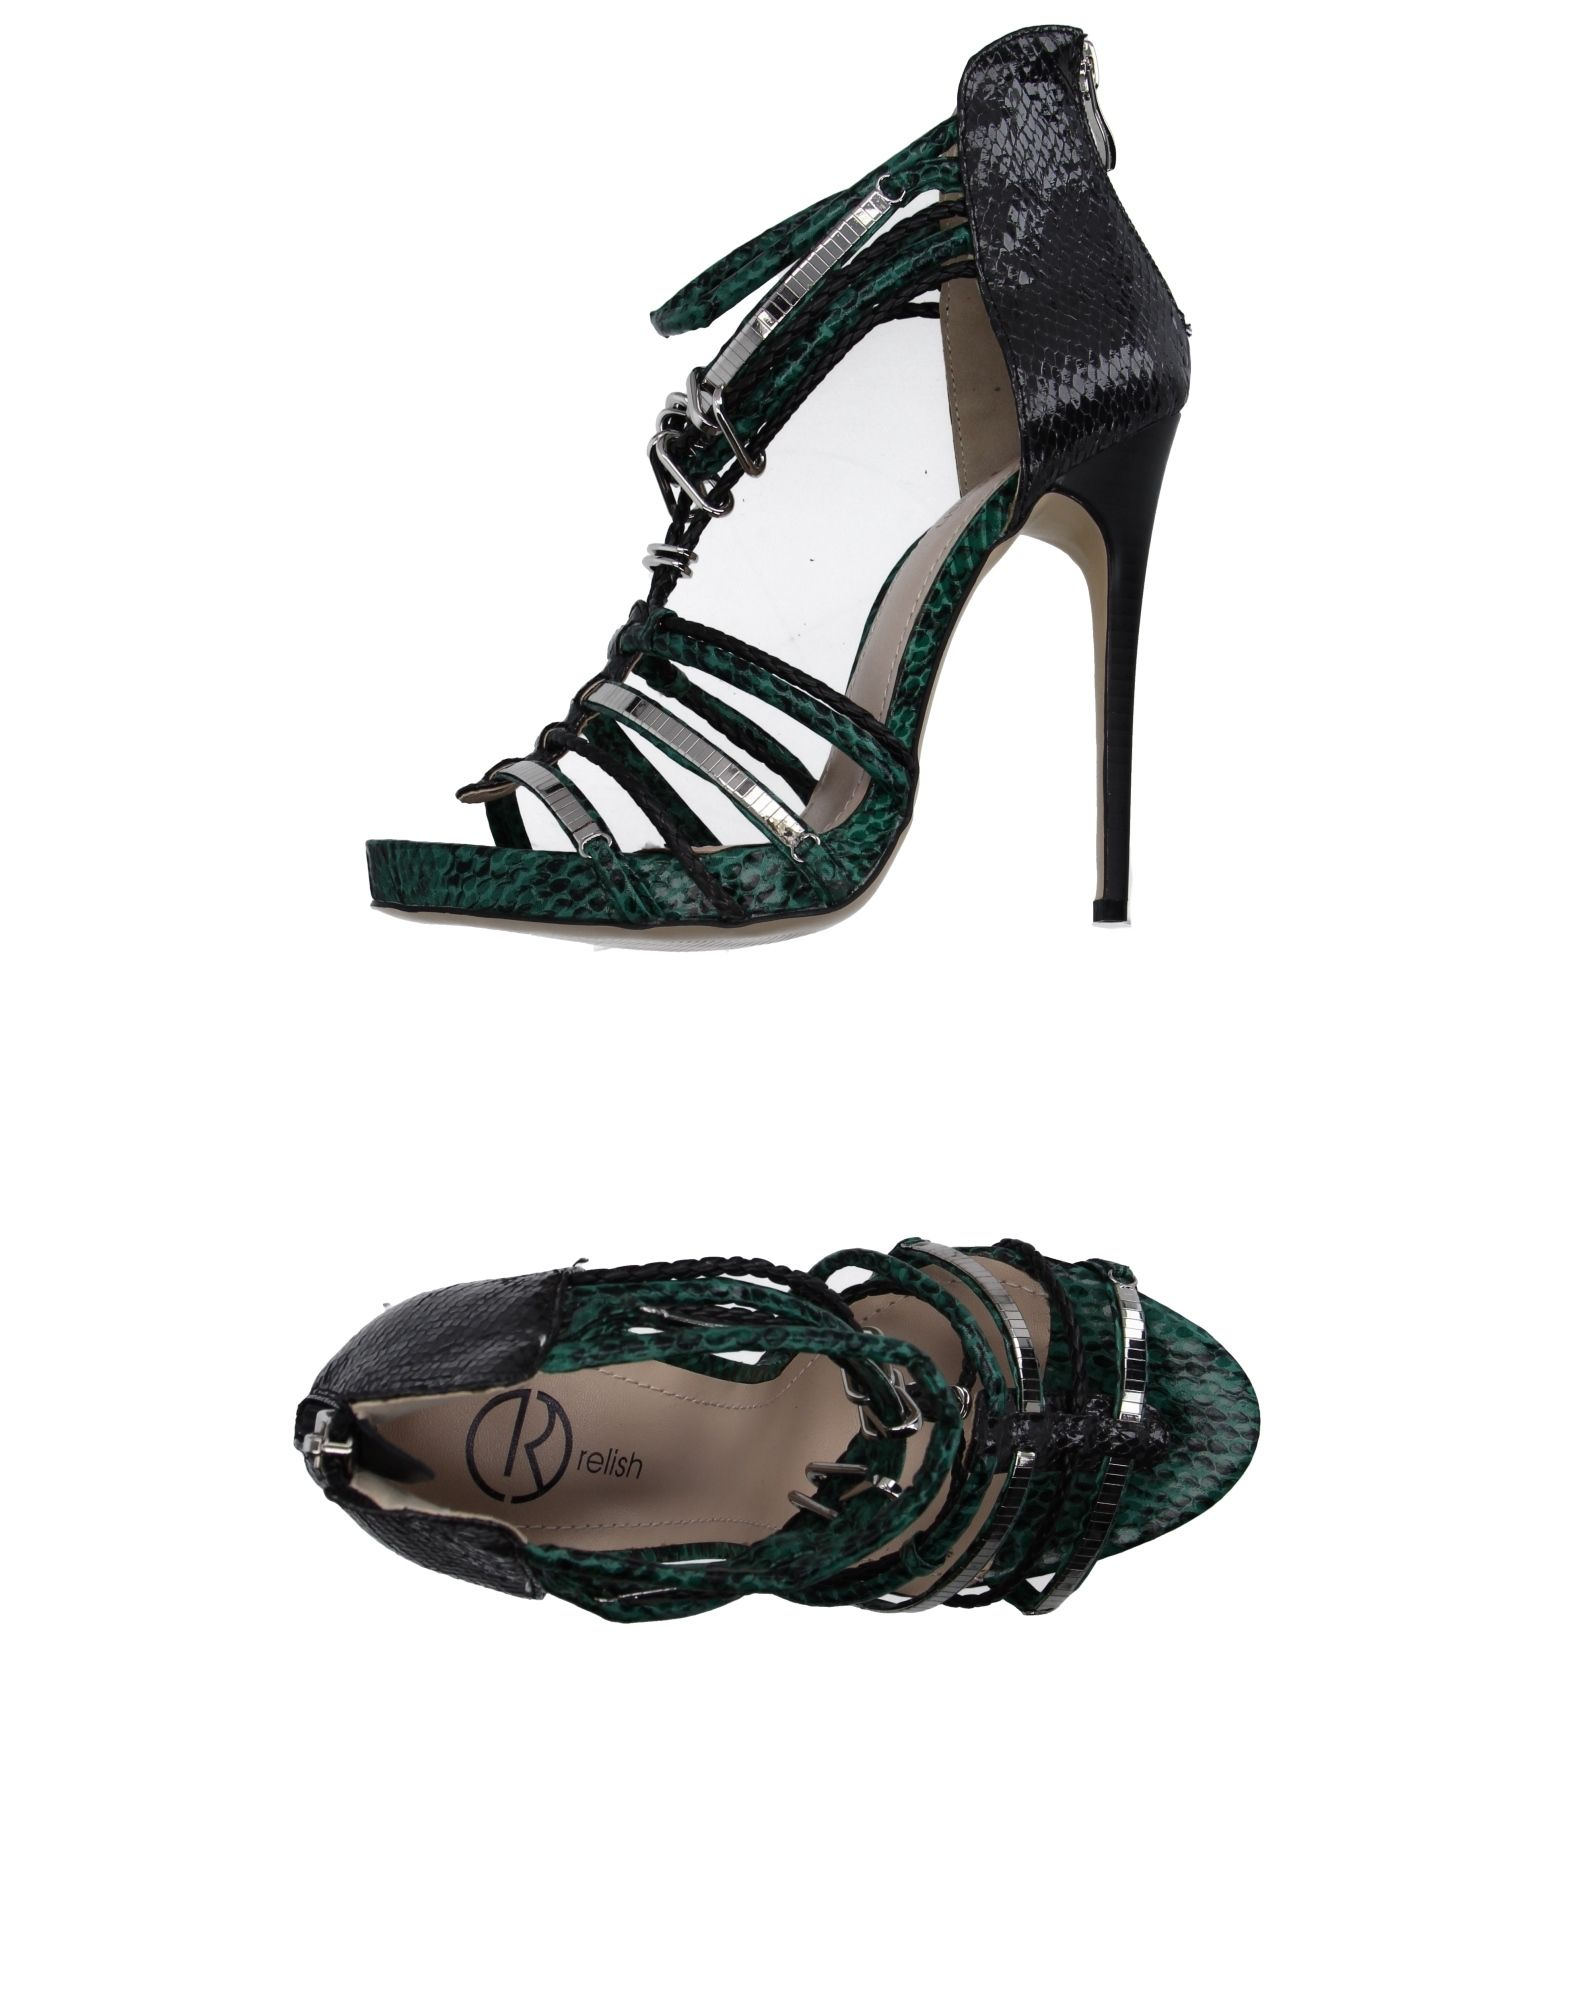 Relish Sandalen Damen  11165712FB Gute Qualität beliebte Schuhe